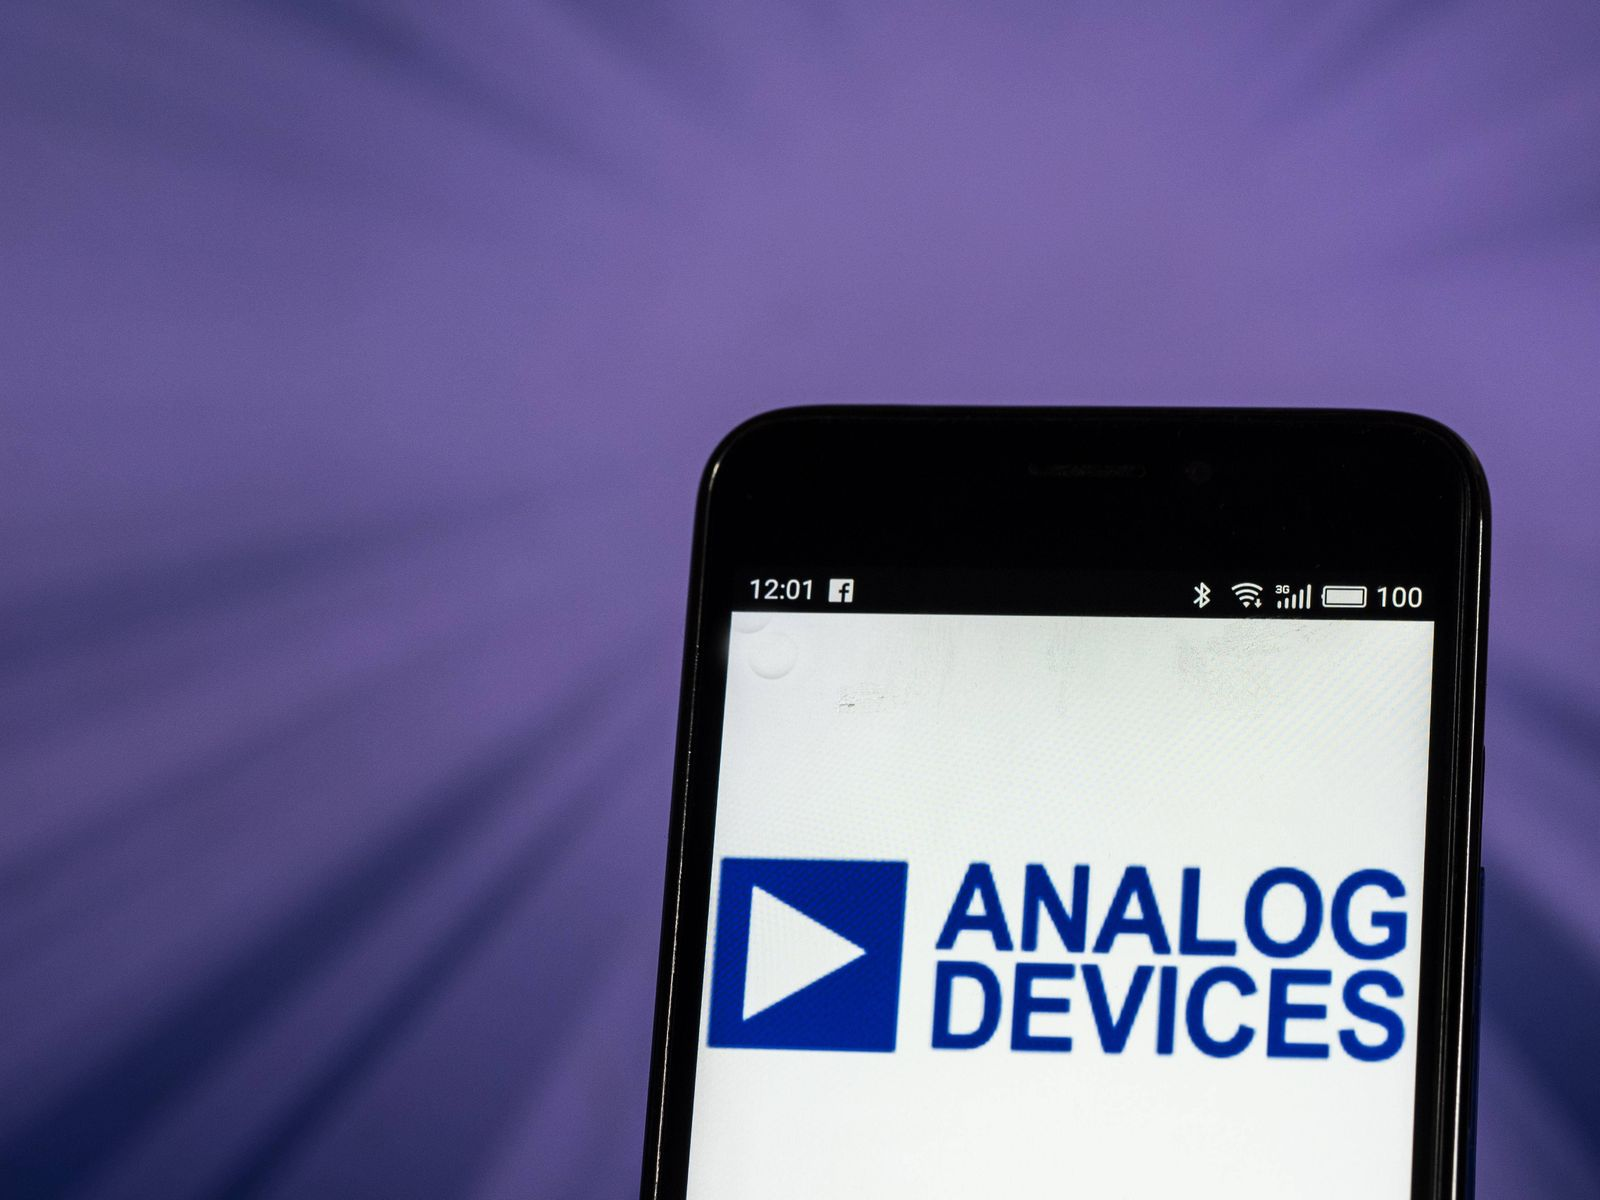 October 26 2018 Kiev Ukraine Analog Devices Inc logo seen displayed on smart phone Analog De